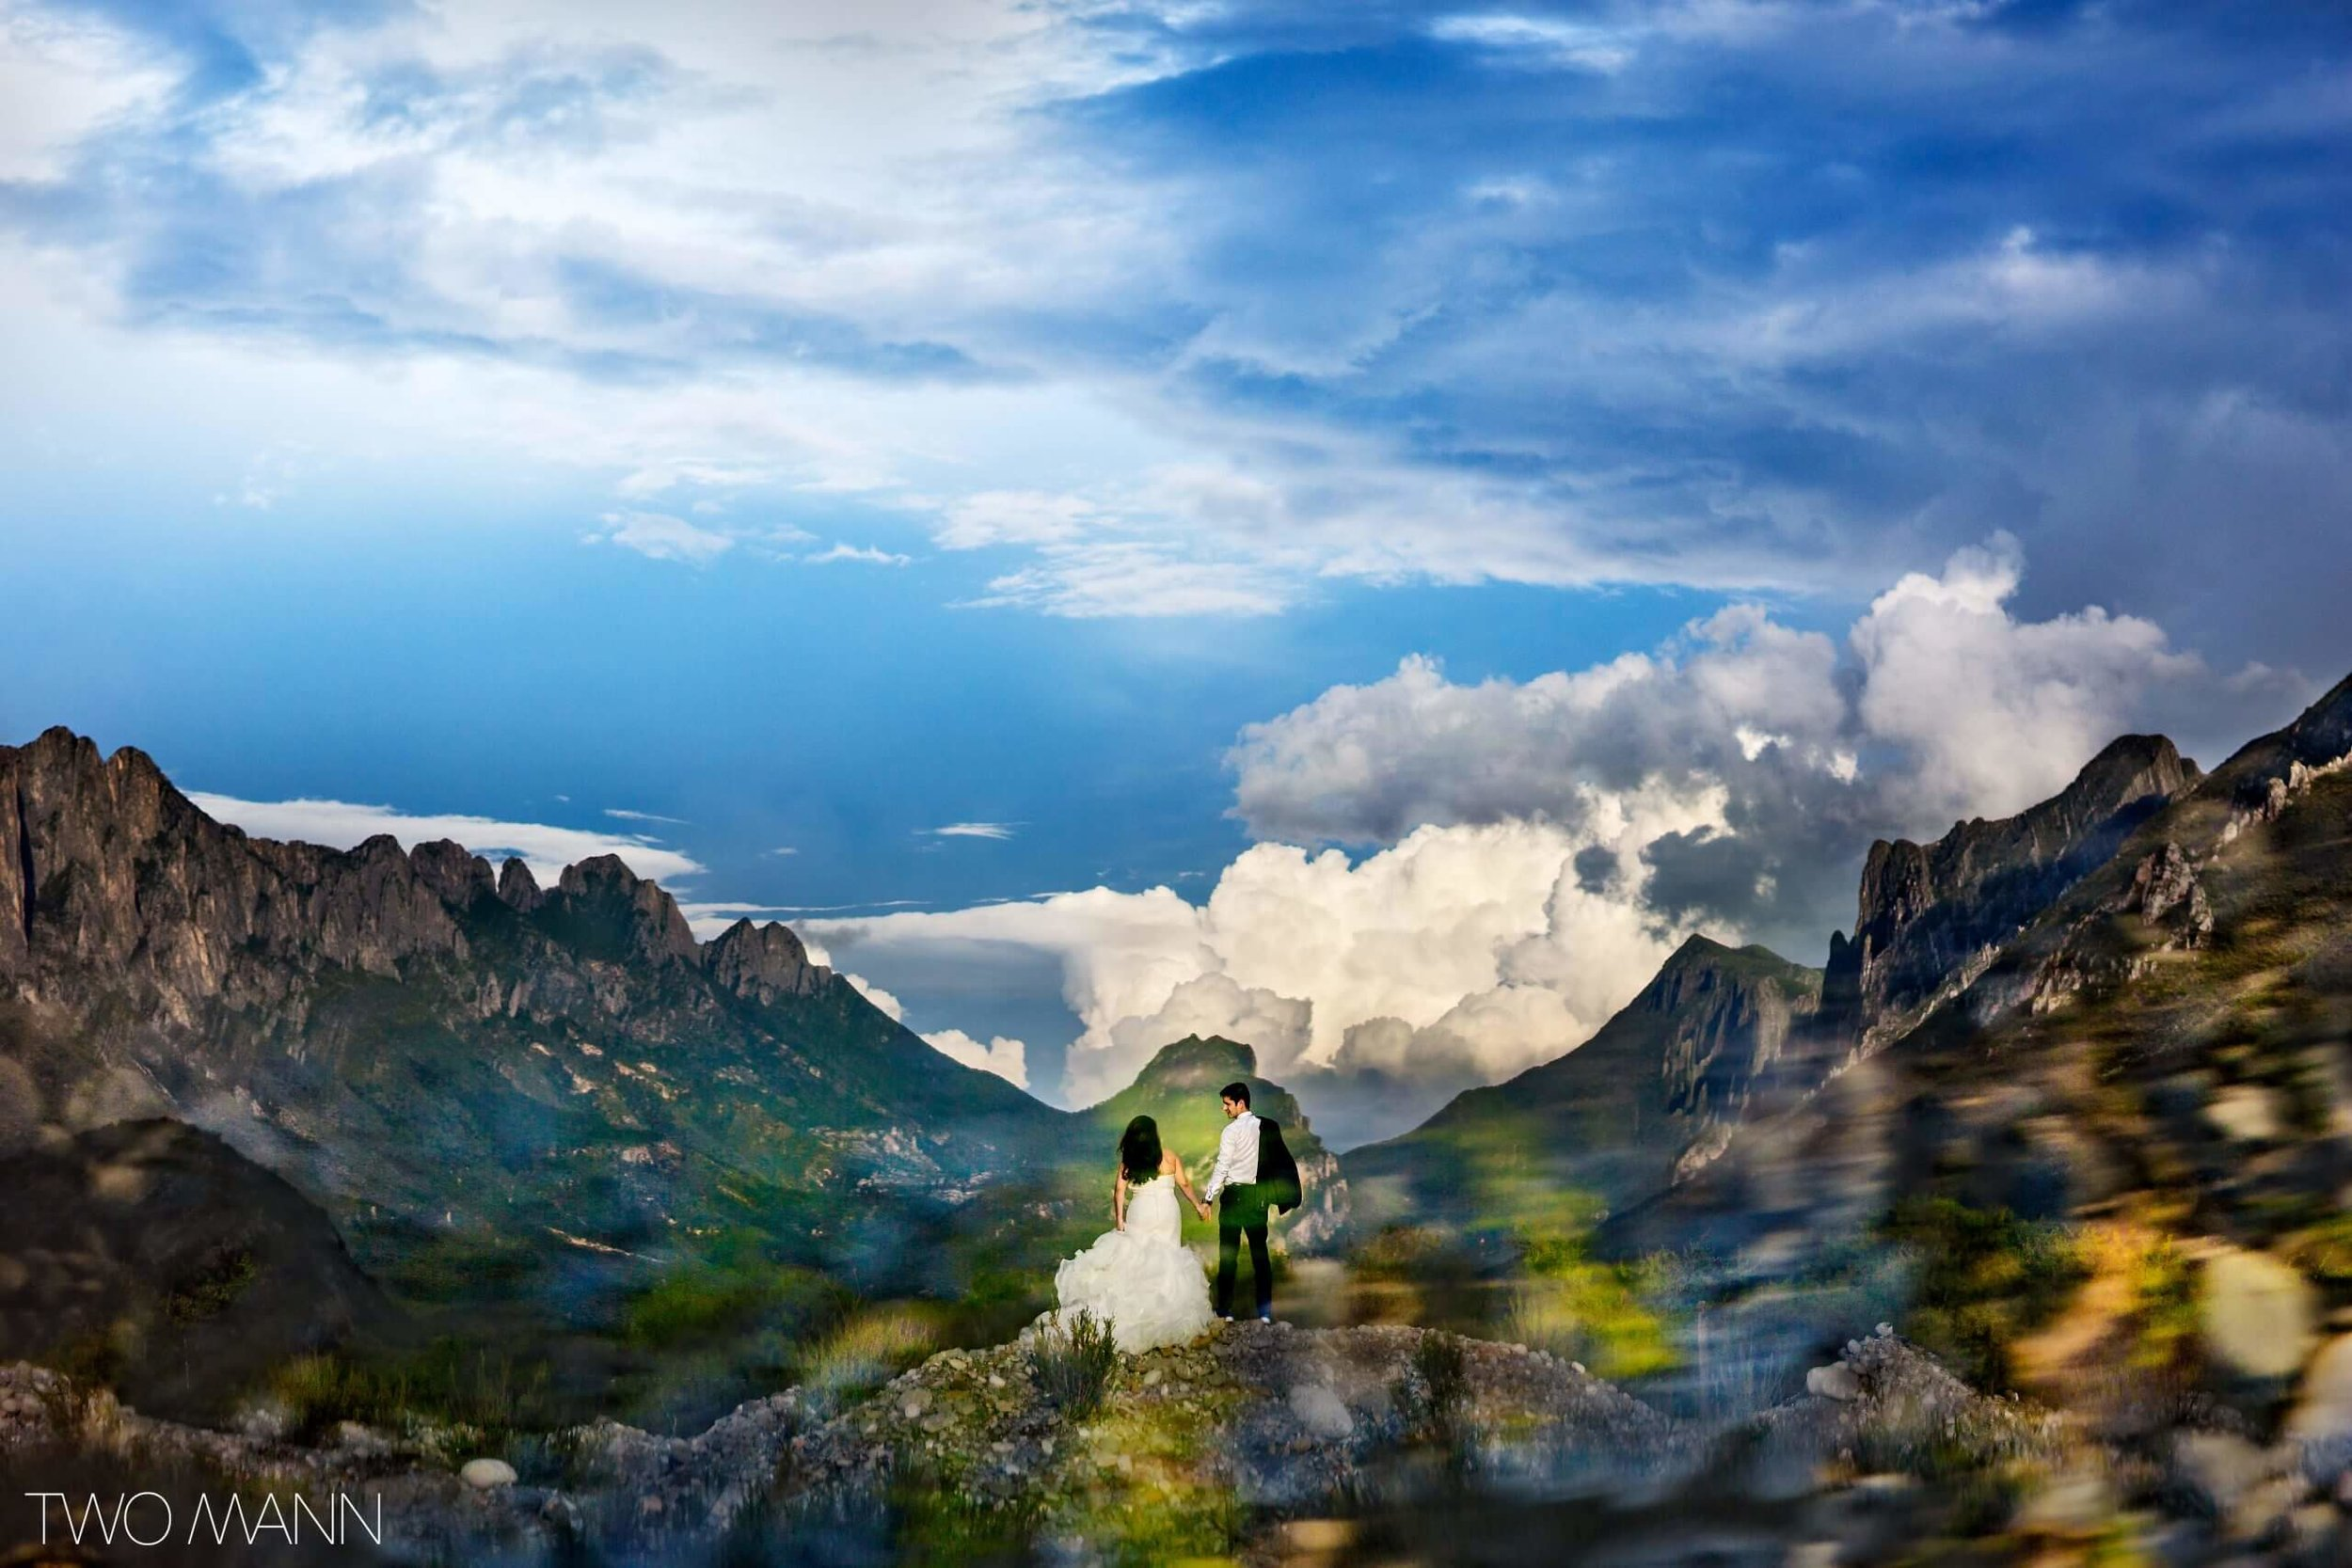 Mexico-Wedding-Photography-Two-Mann-Monica-Mike-Monterrey-28-2560x1707.jpg